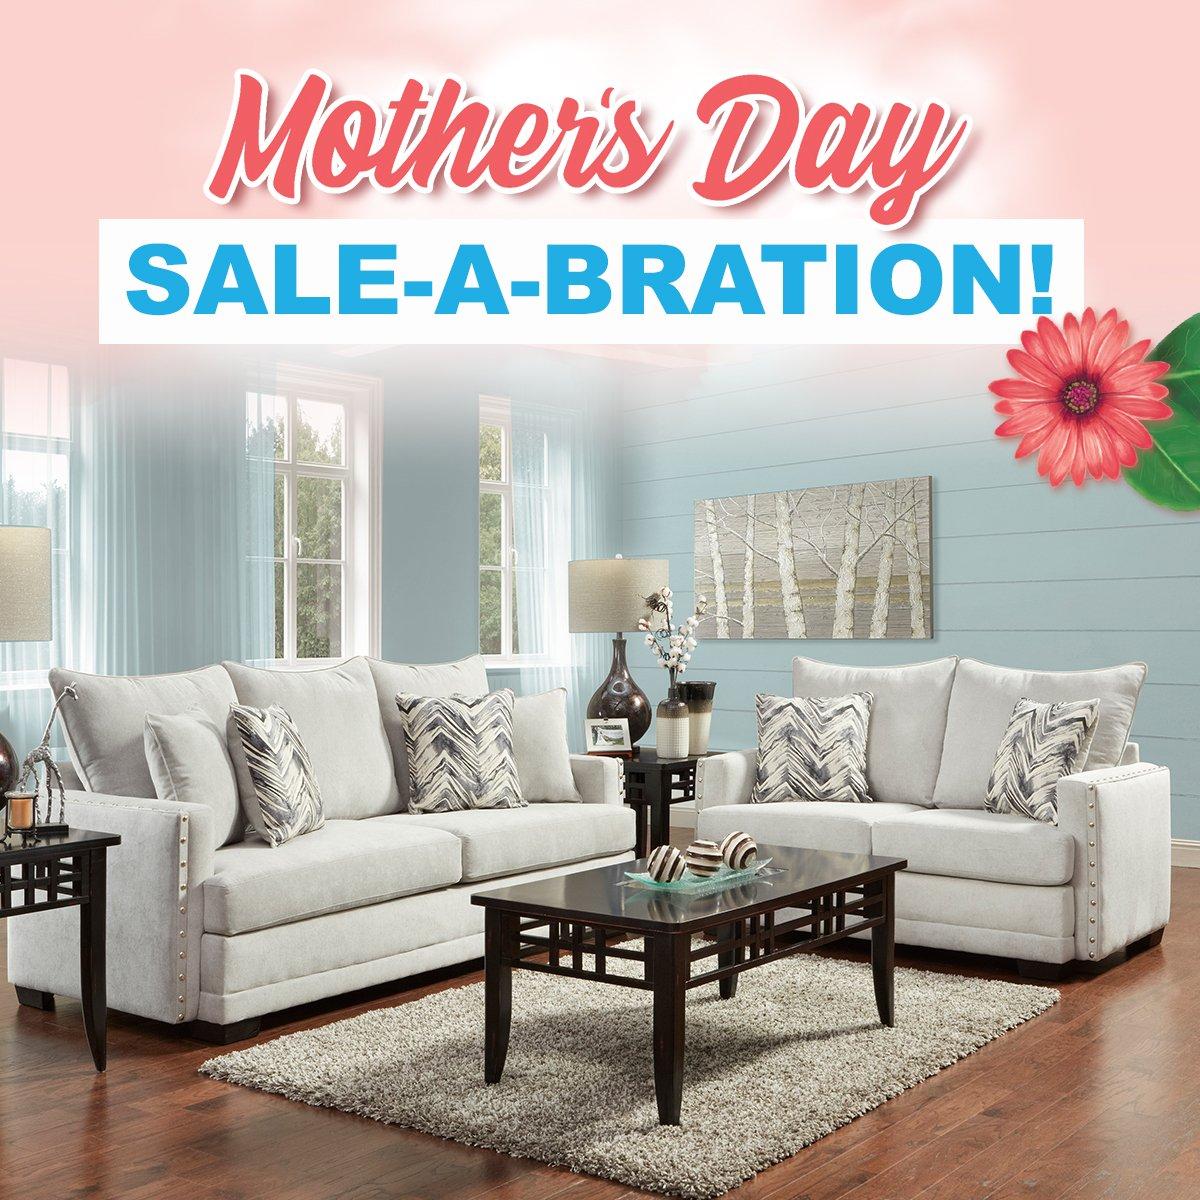 Strange Badcocksfl On Twitter Start Shopping For Mothers Day With Creativecarmelina Interior Chair Design Creativecarmelinacom